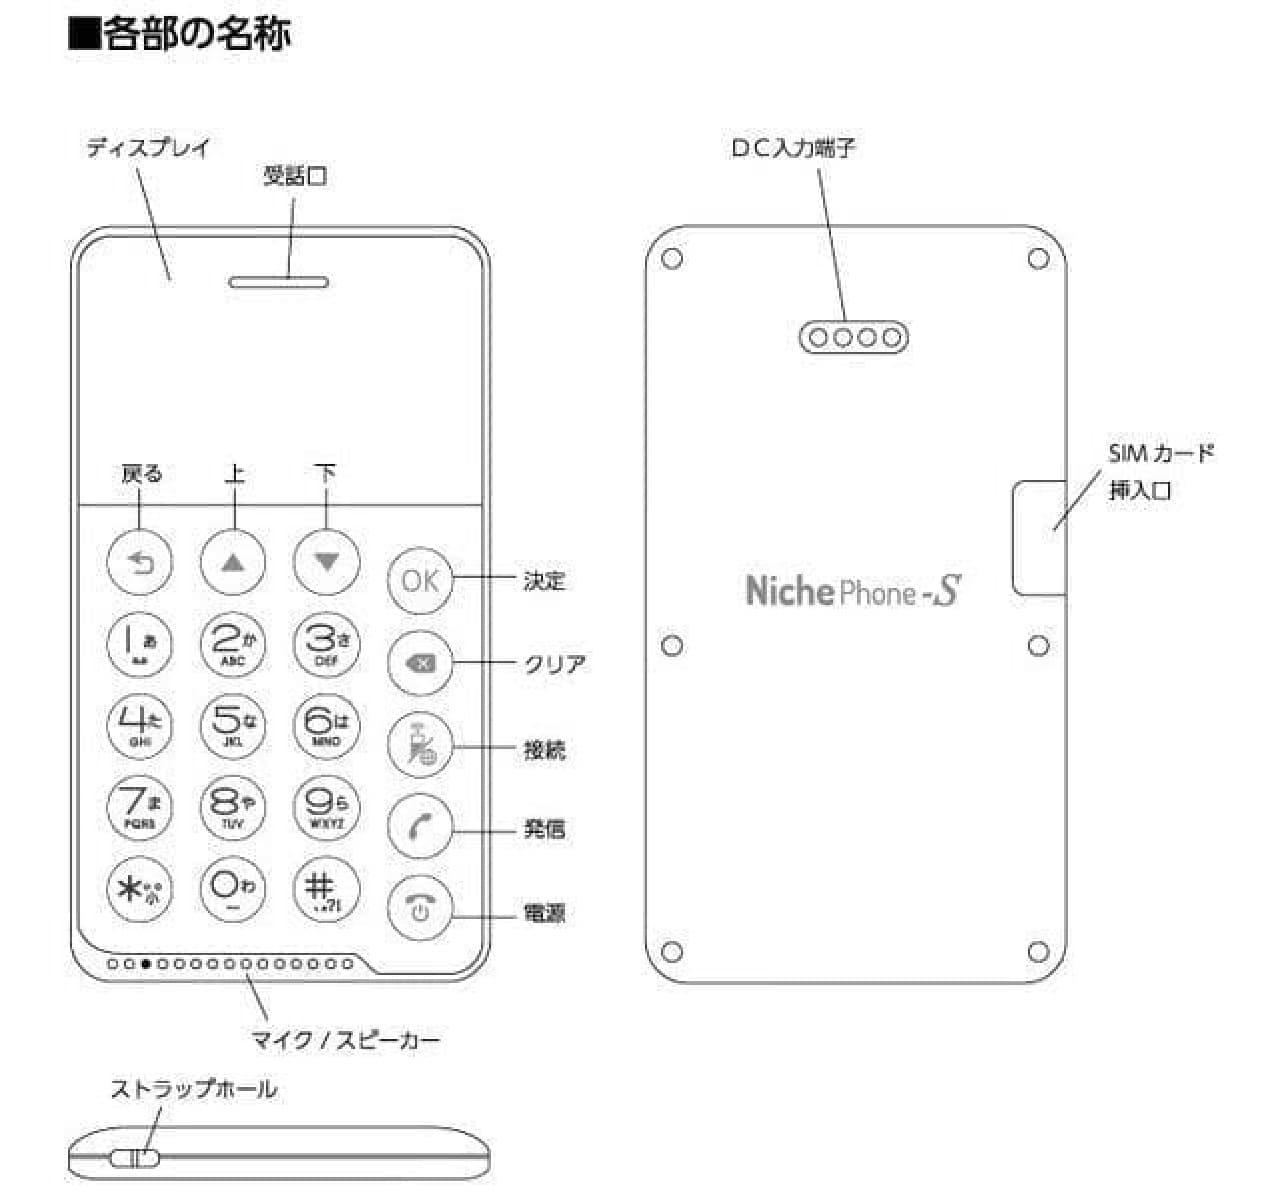 SIMフリーガラケー「NichePhone-S」